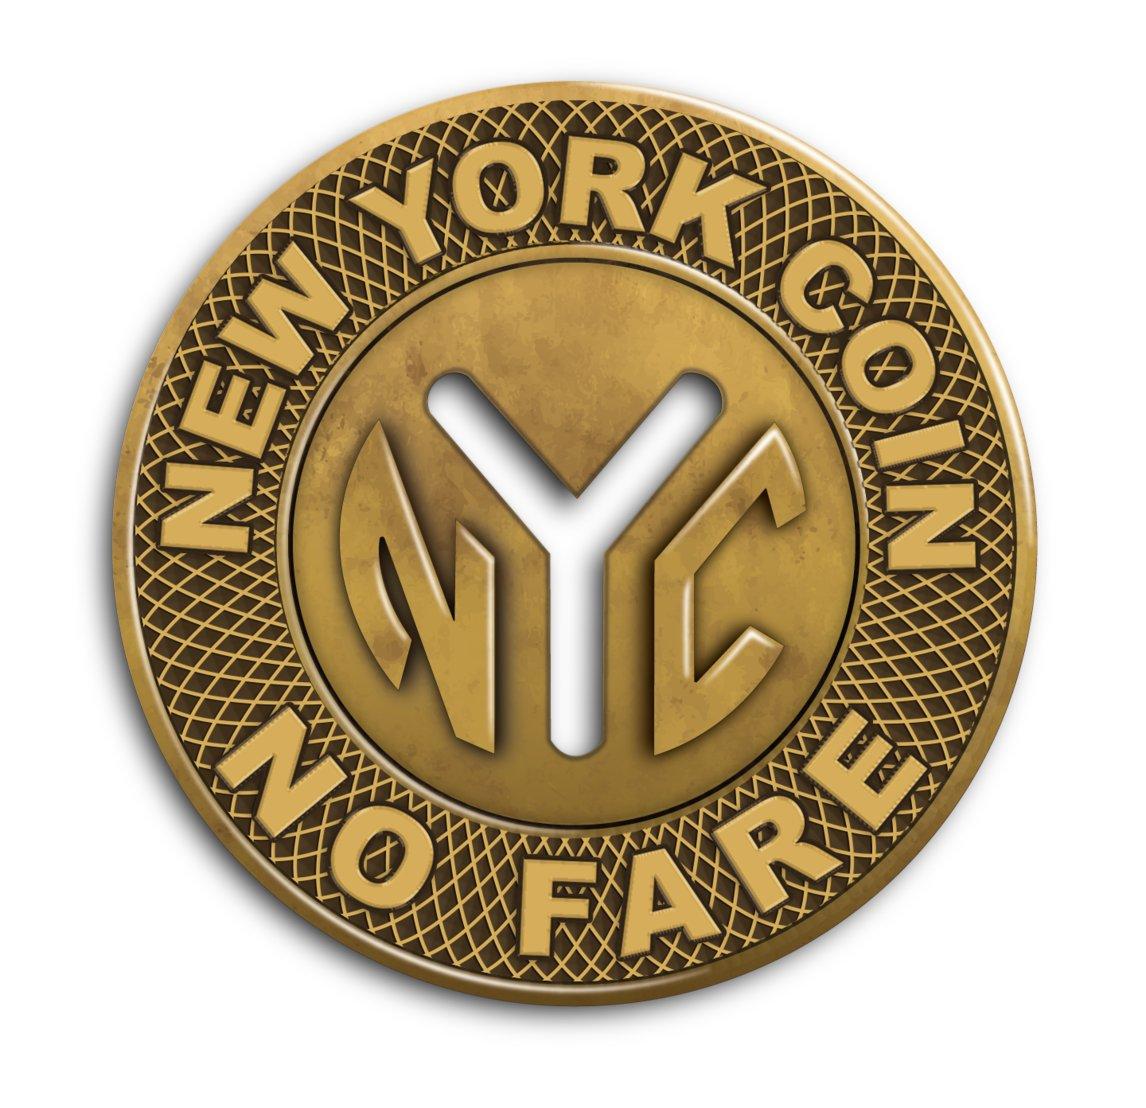 Tweet by @NewYorkCoinNYC